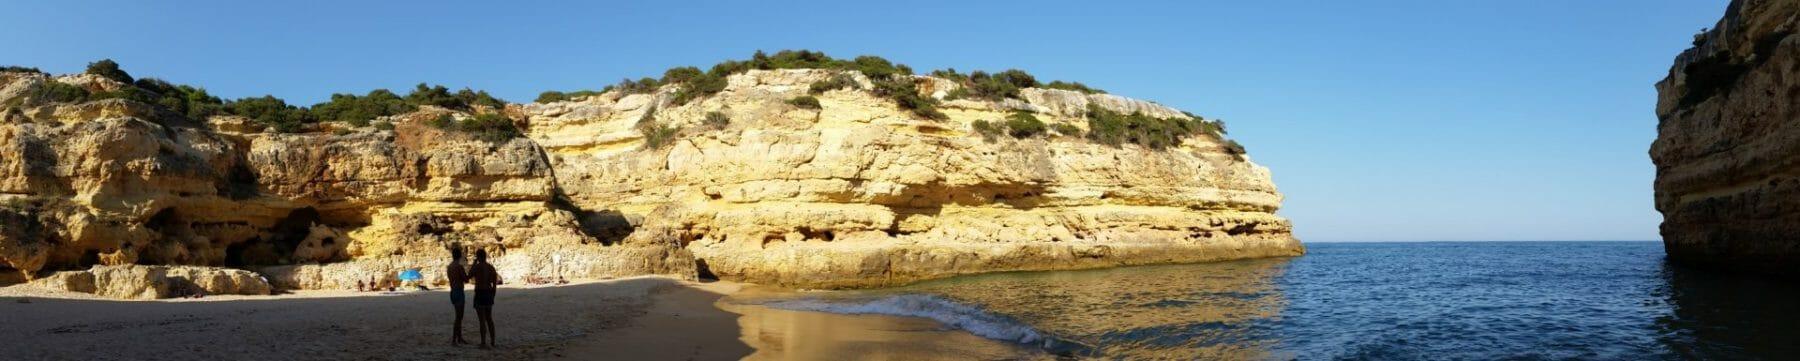 Versteckte Sandbucht Felsenalgarve